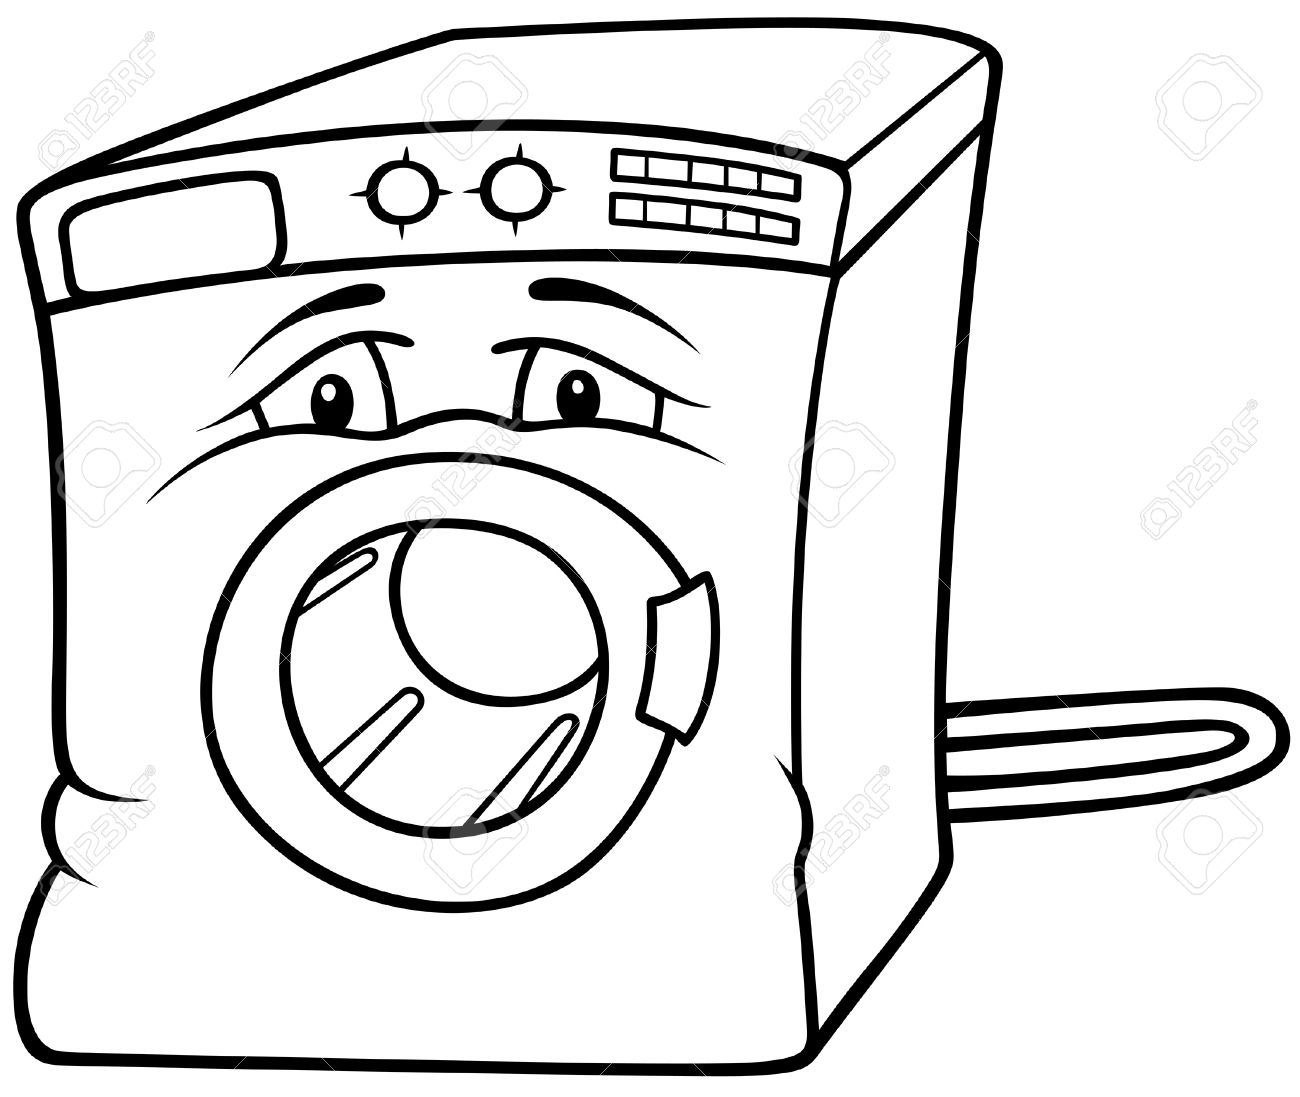 washing machine drawing. washing machine - black and white cartoon illustration, vector stock 8663621 drawing